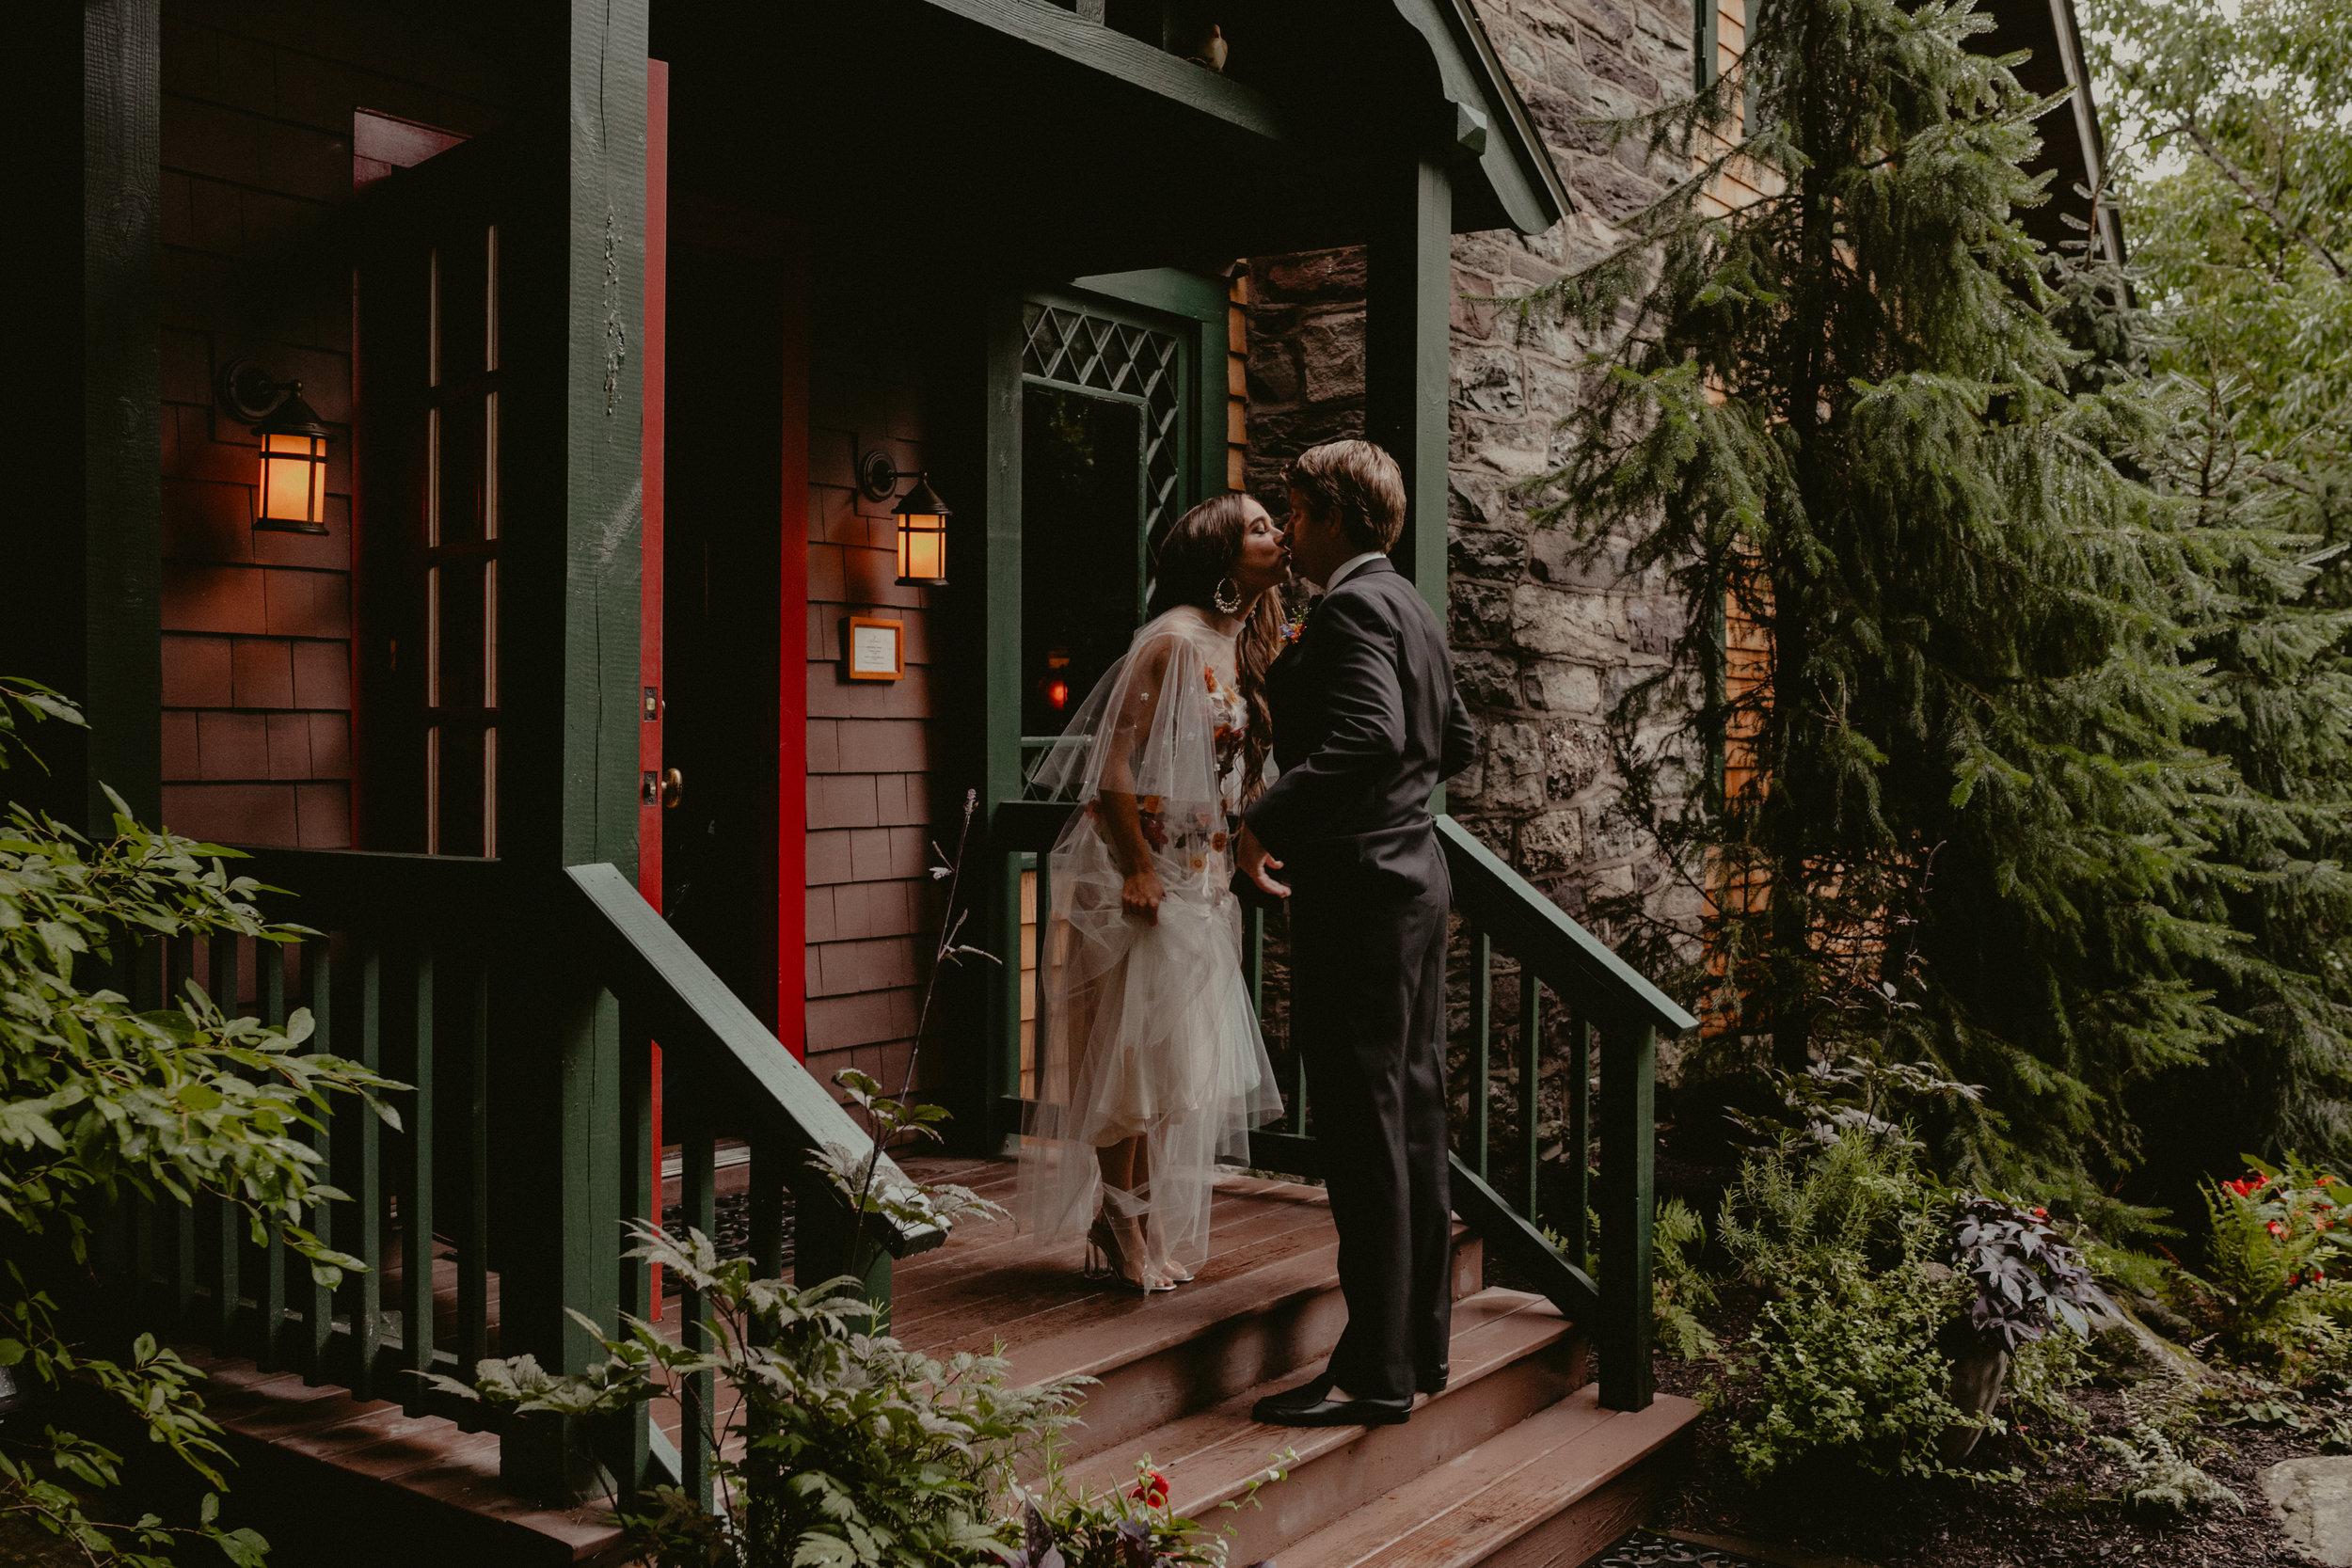 DEER_MOUNTAIN_INN_WEDDING_CHELLISE_MICHAEL_PHOTOGRAPHY-1143.jpg